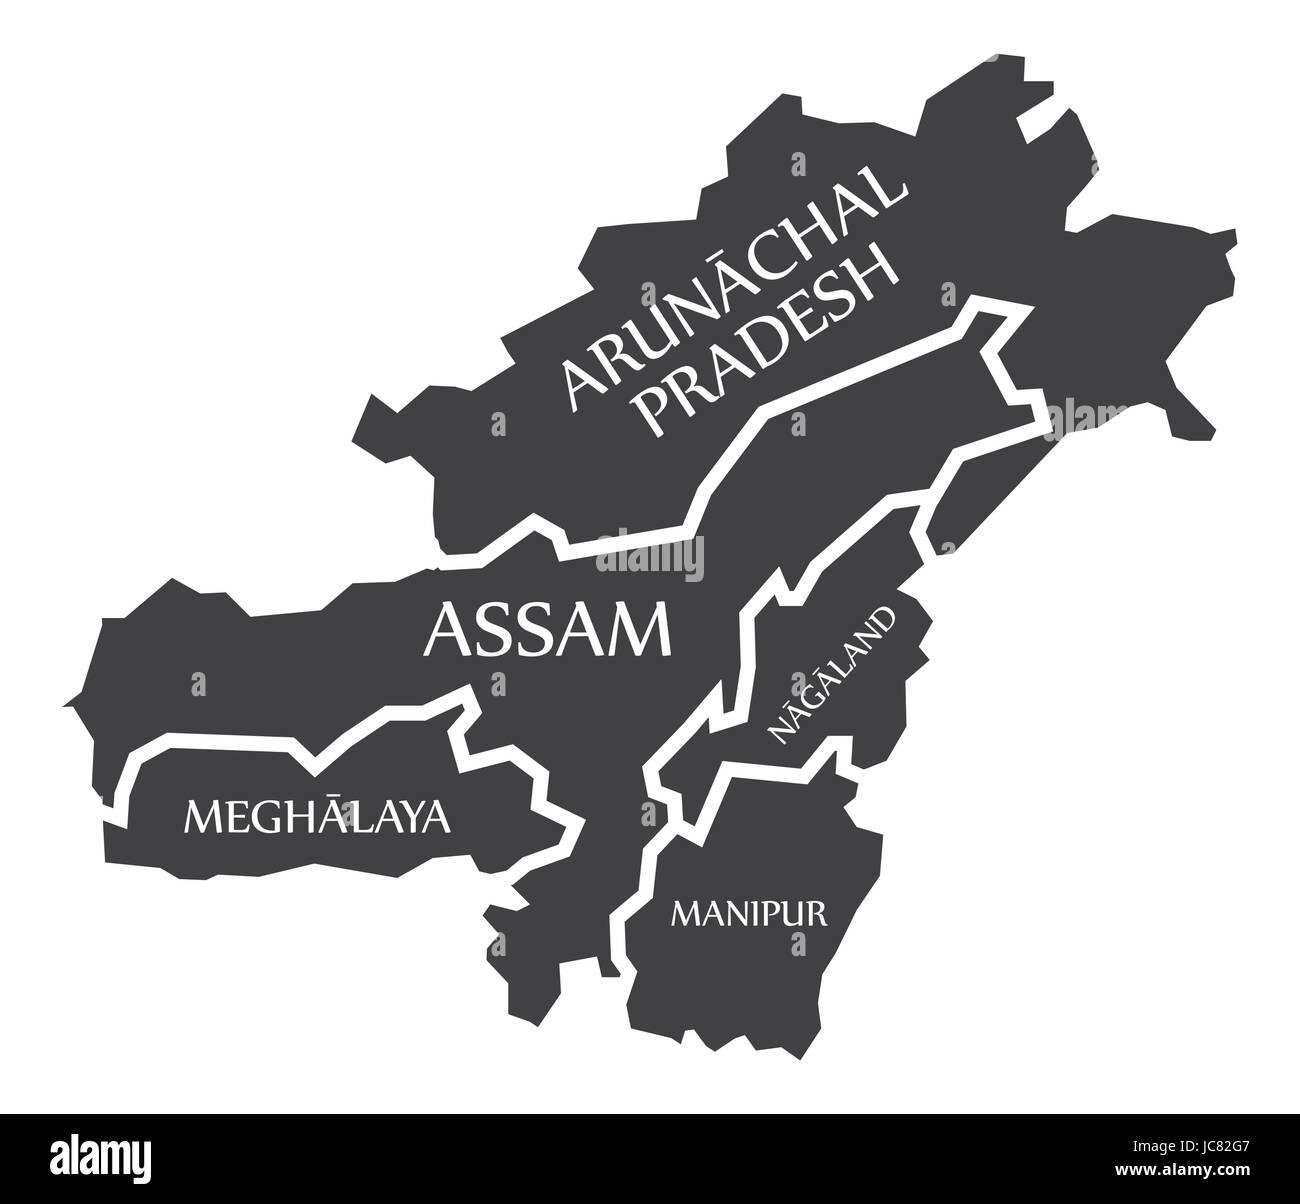 Assam Map Stock Photos & Assam Map Stock Images - Alamy